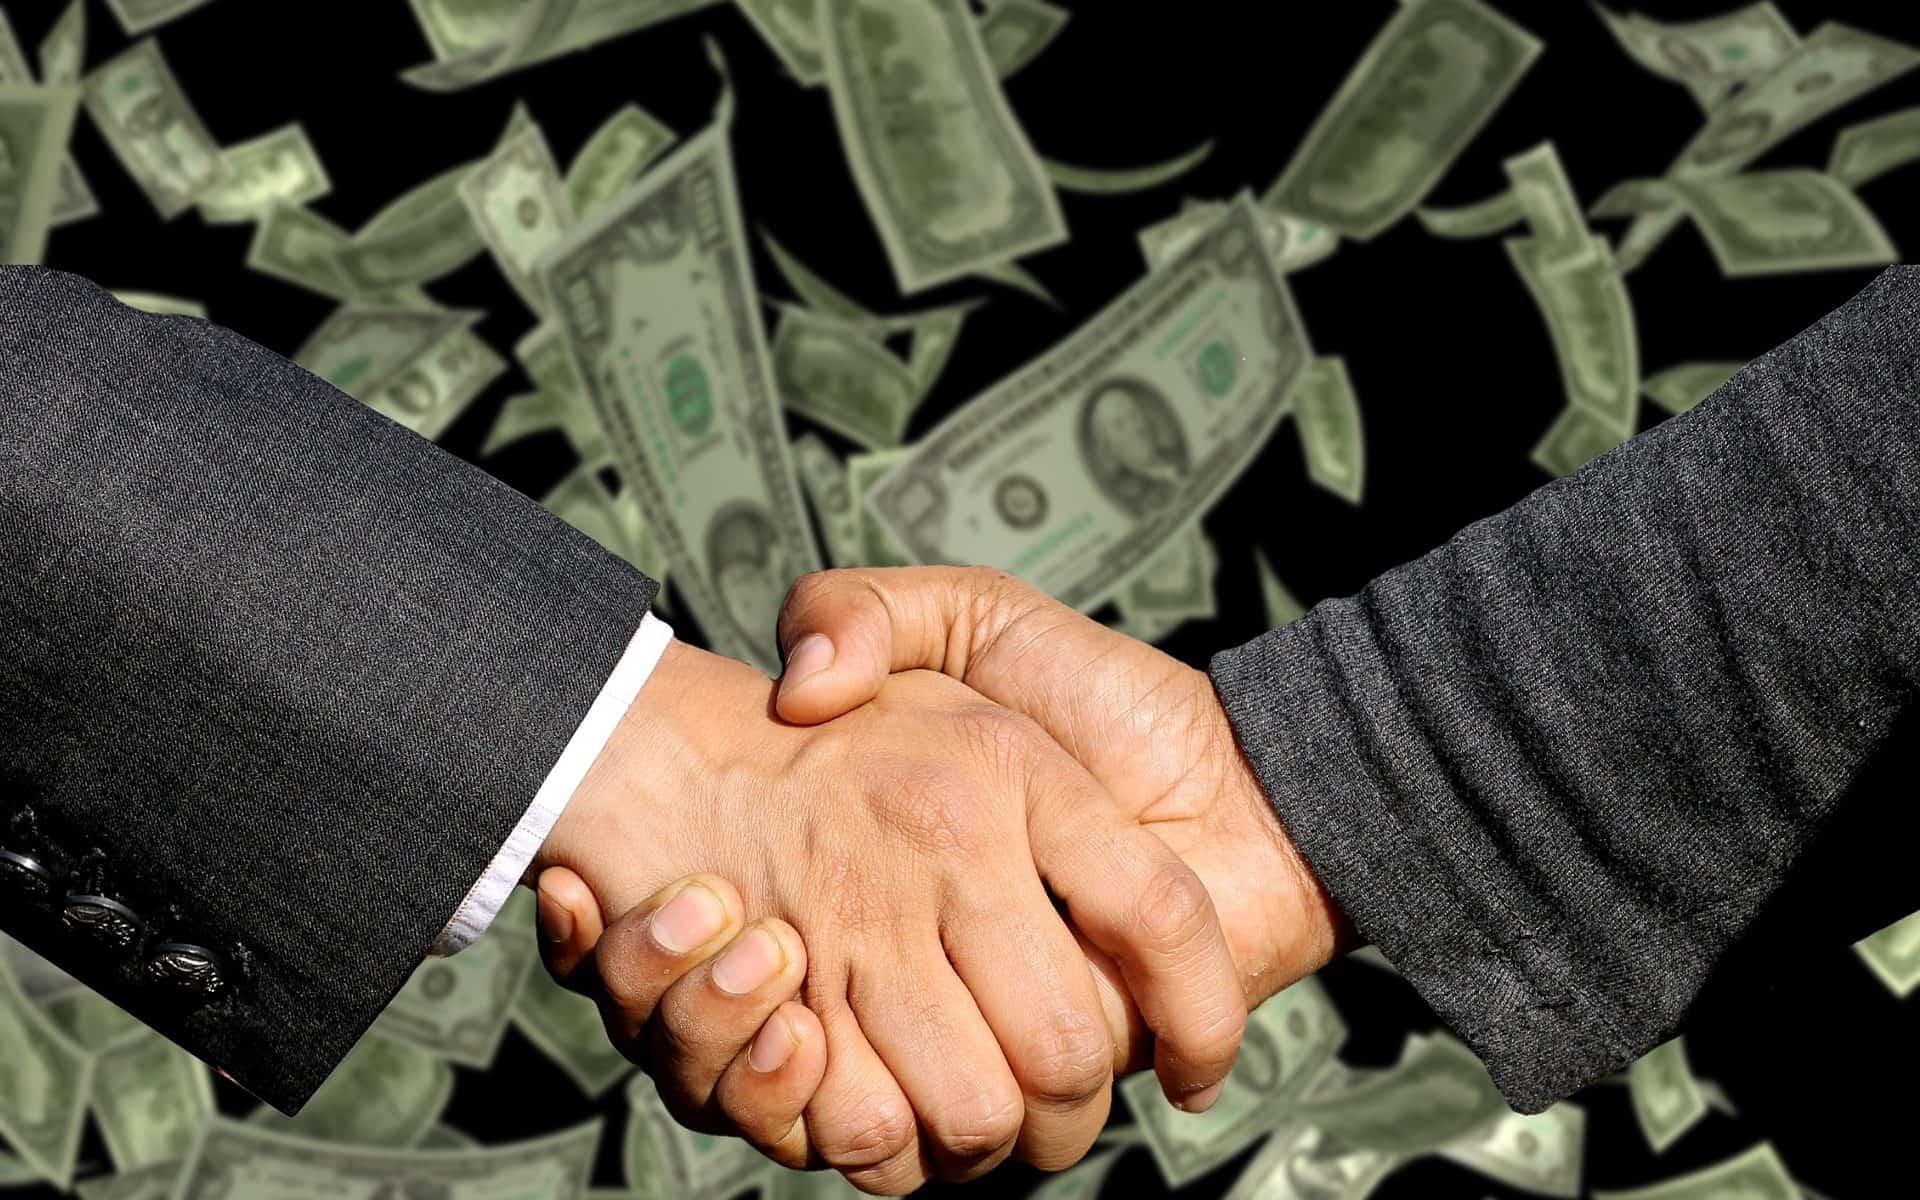 eToro Makes A Big Move into The Tokenized Economy by Buying Firmo